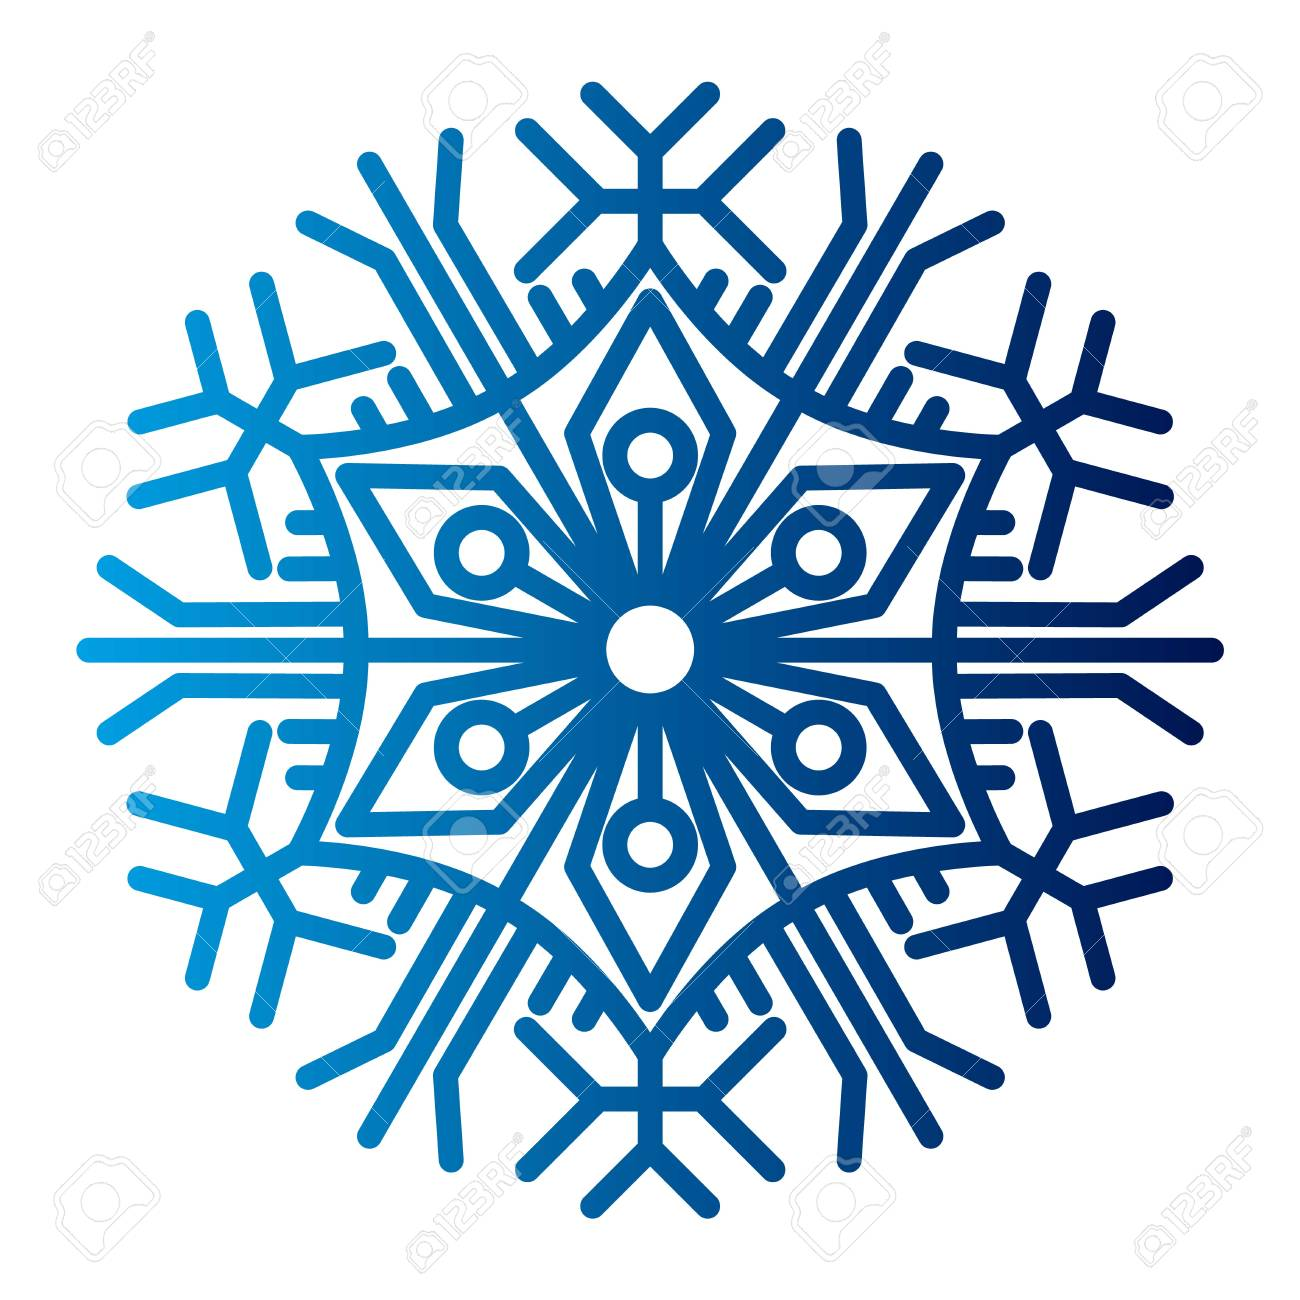 snowflake vector illustration and season nature winter sign symbol rh 123rf com snowflake vector image snowflake vector image